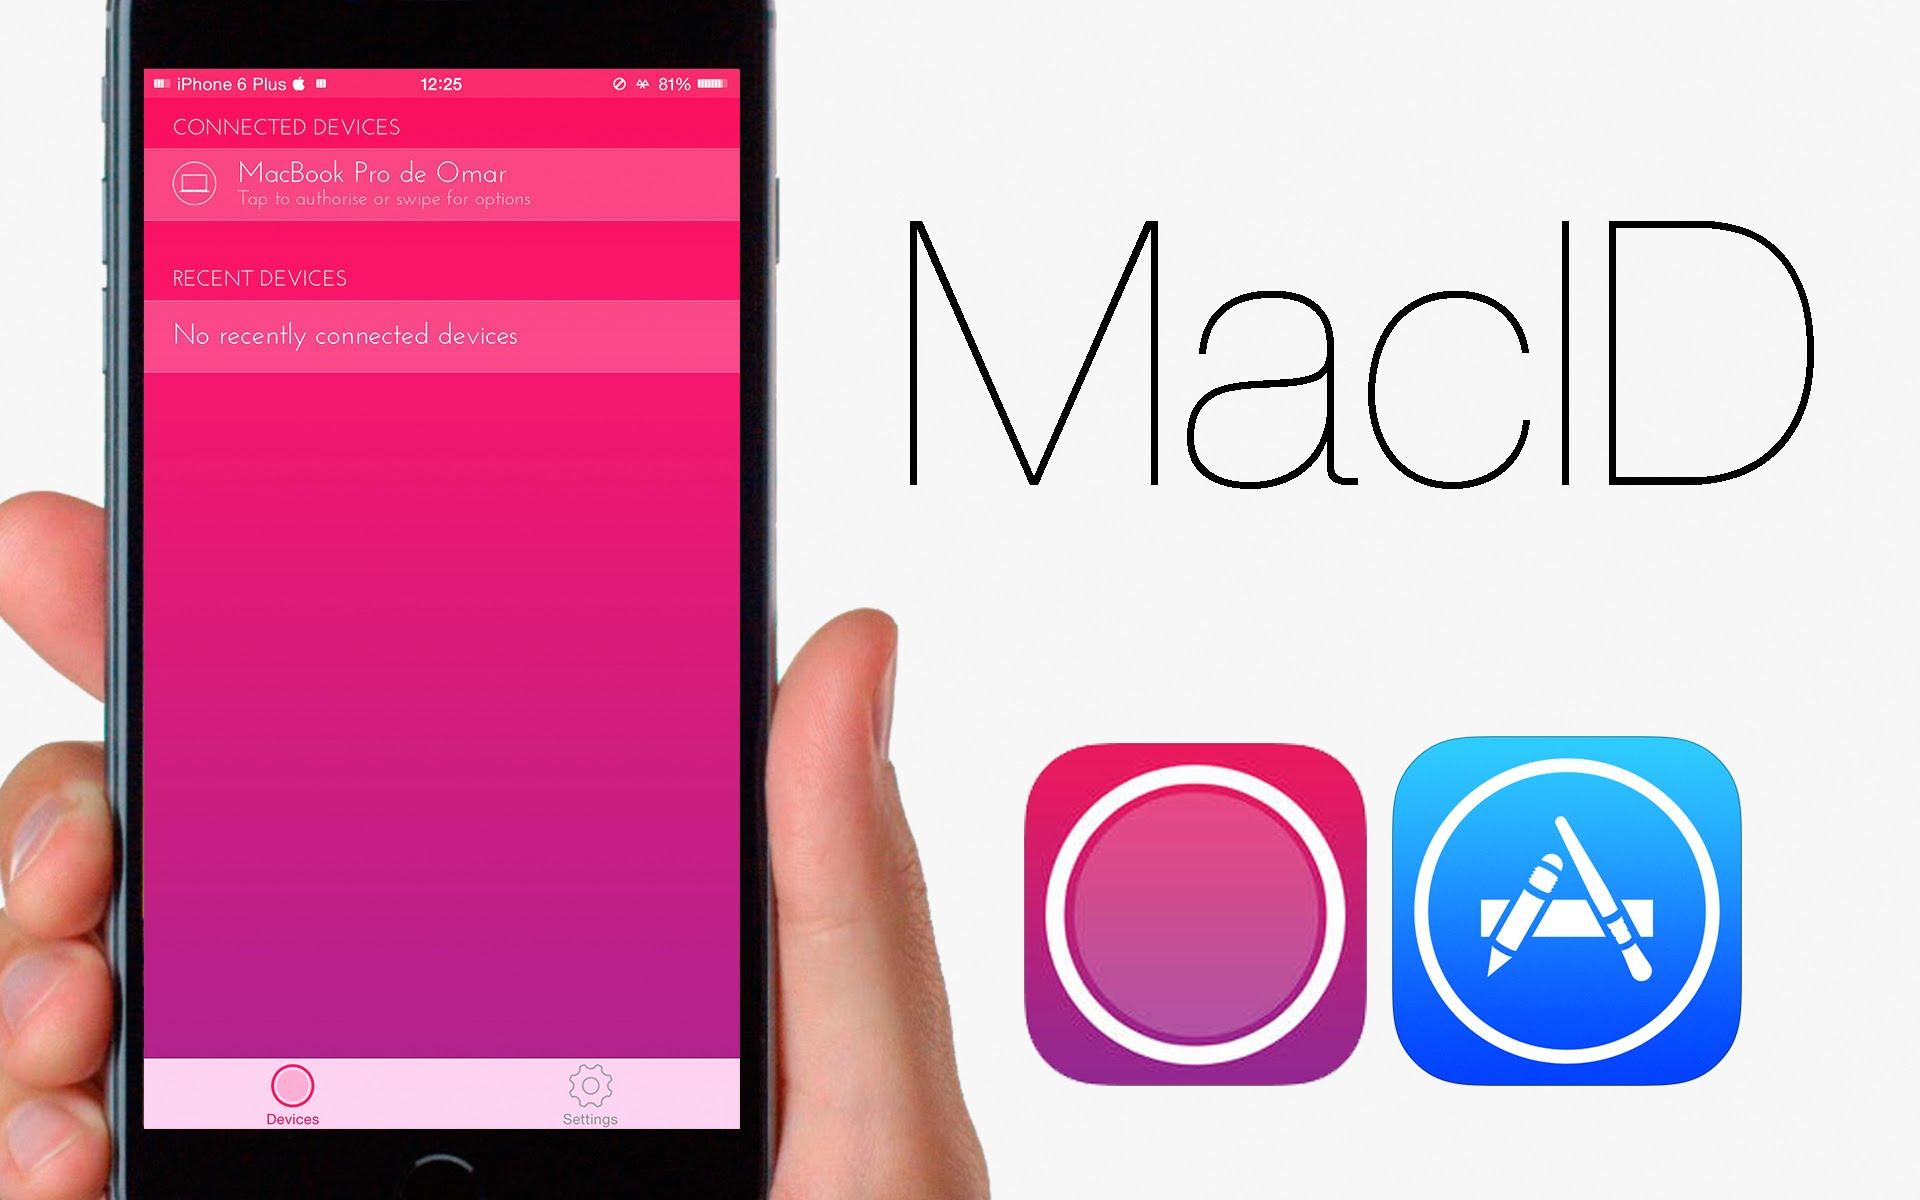 MacID GRATIS para desbloquear tu Mac desde el Touch ID